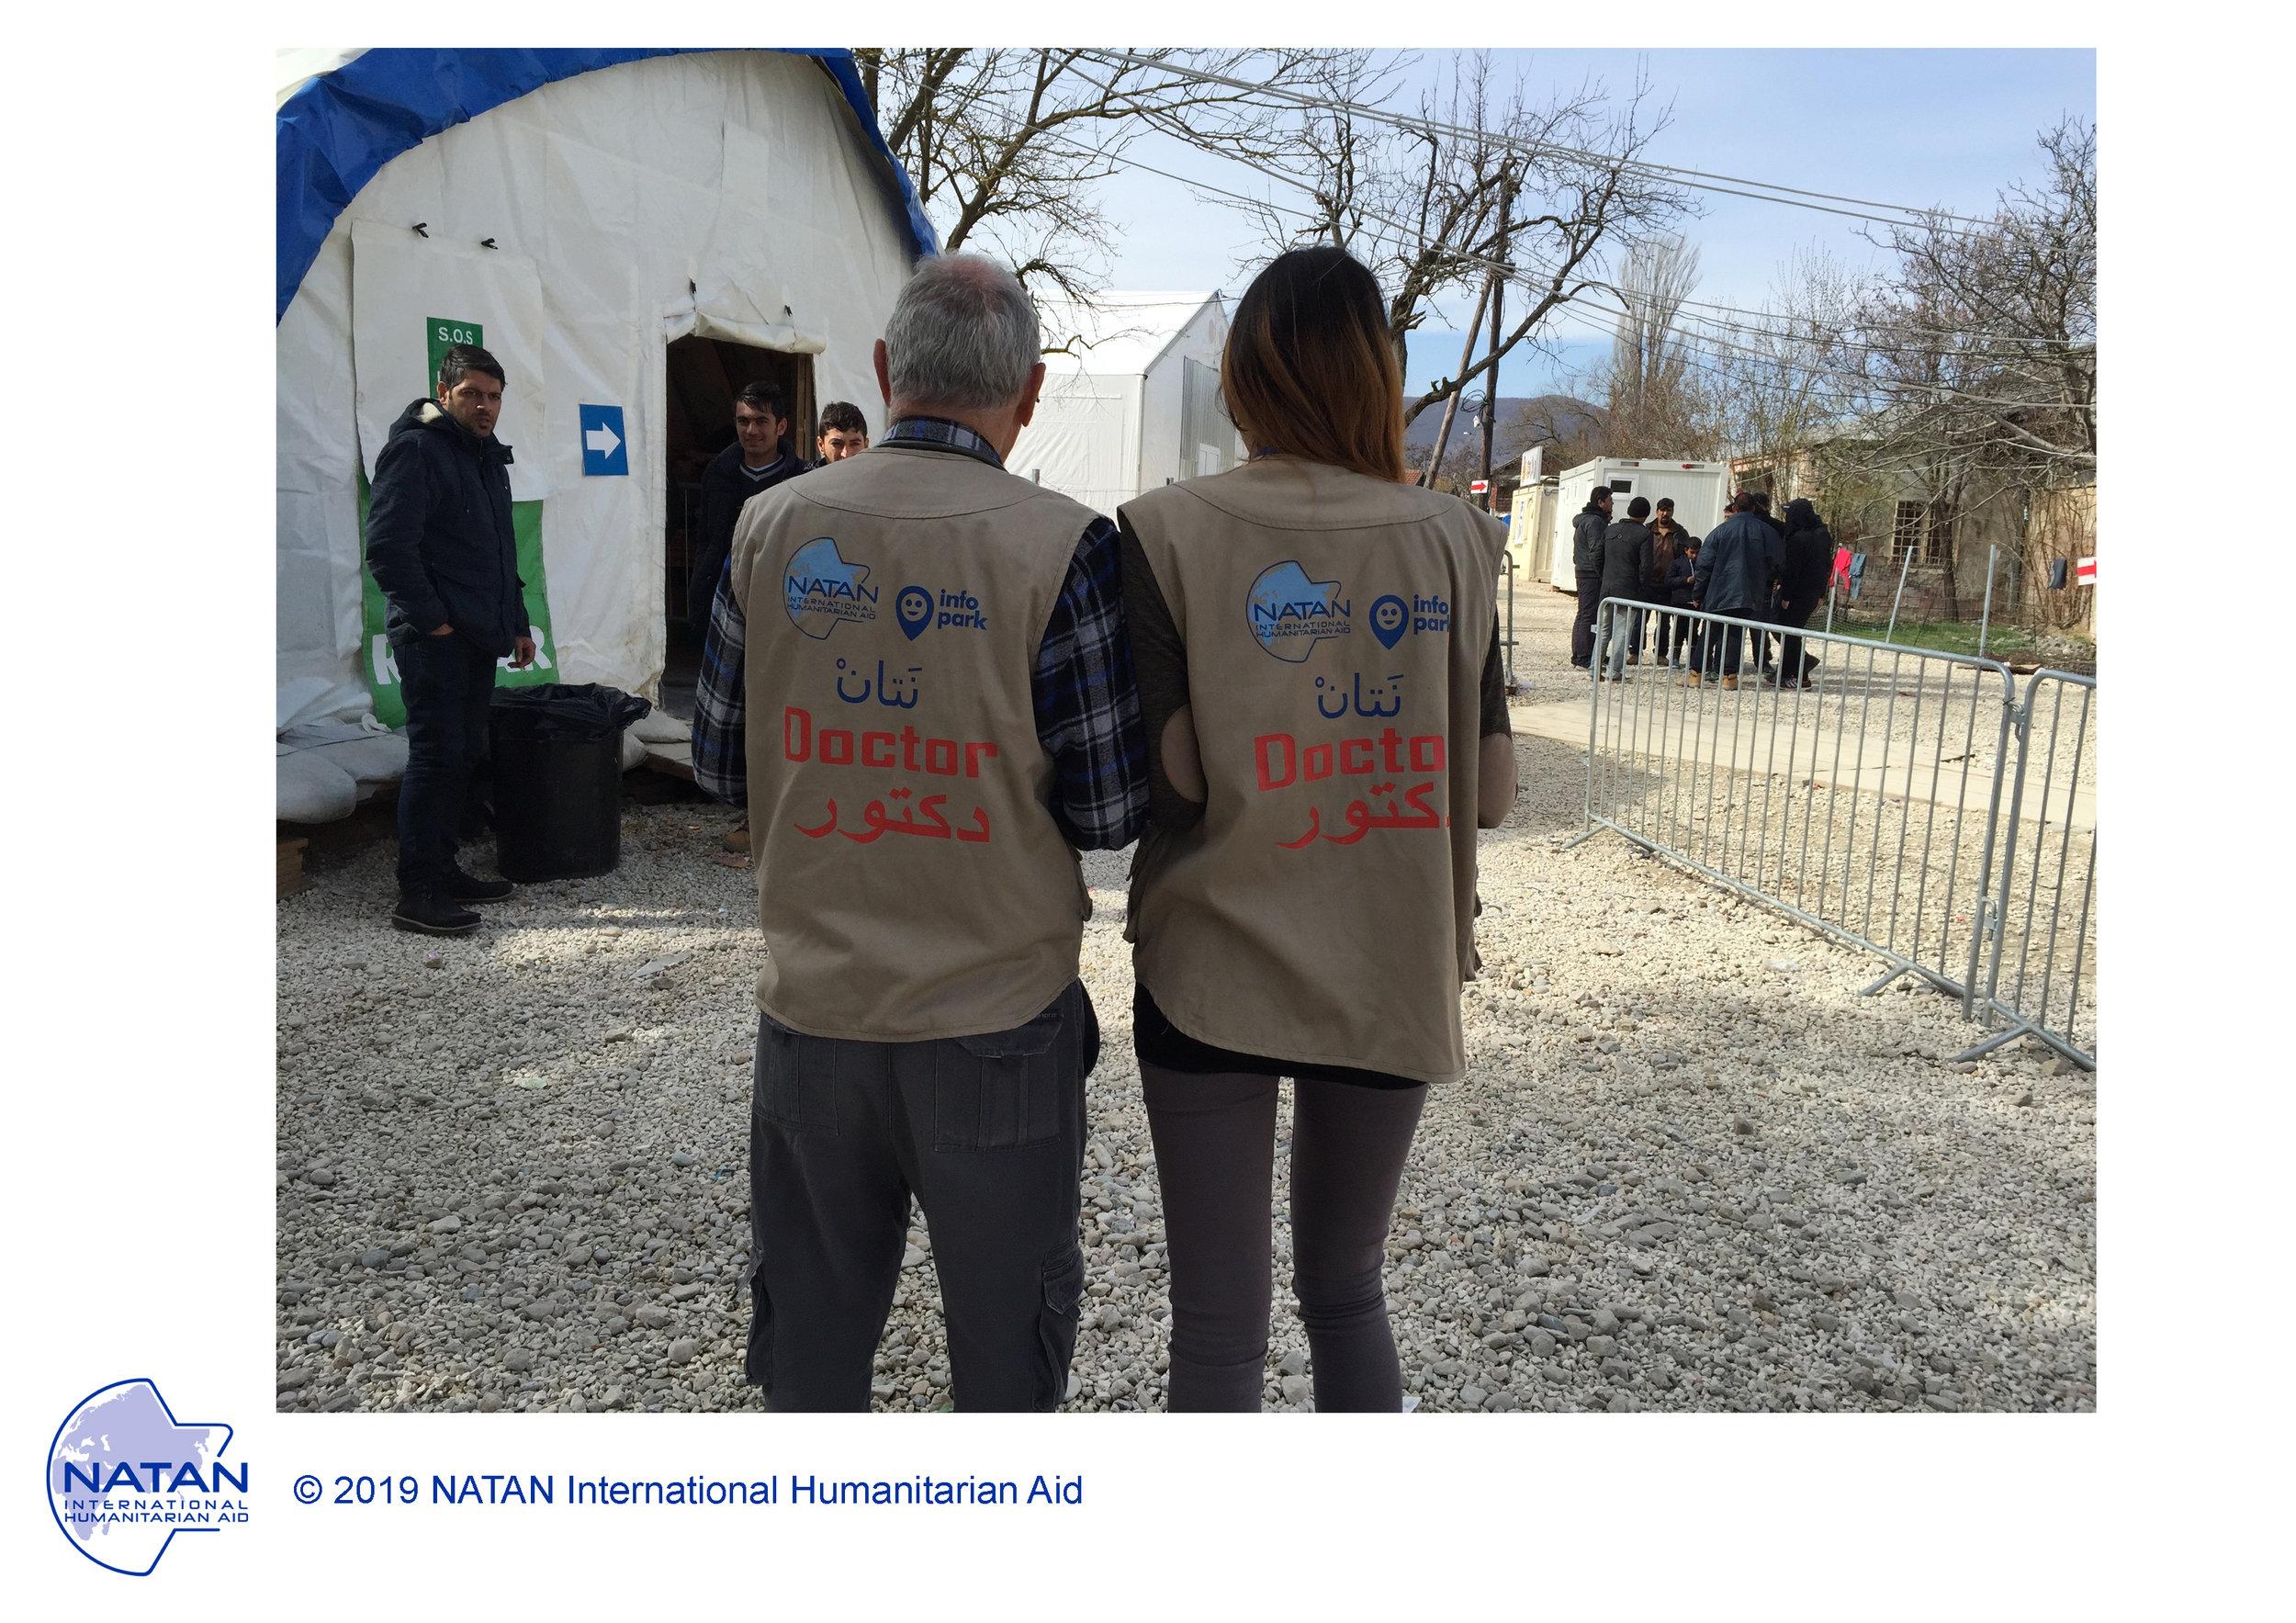 serbia 2016 - natan mds outside clinic for refugees at Presevo transit camp, near the Macedonian border